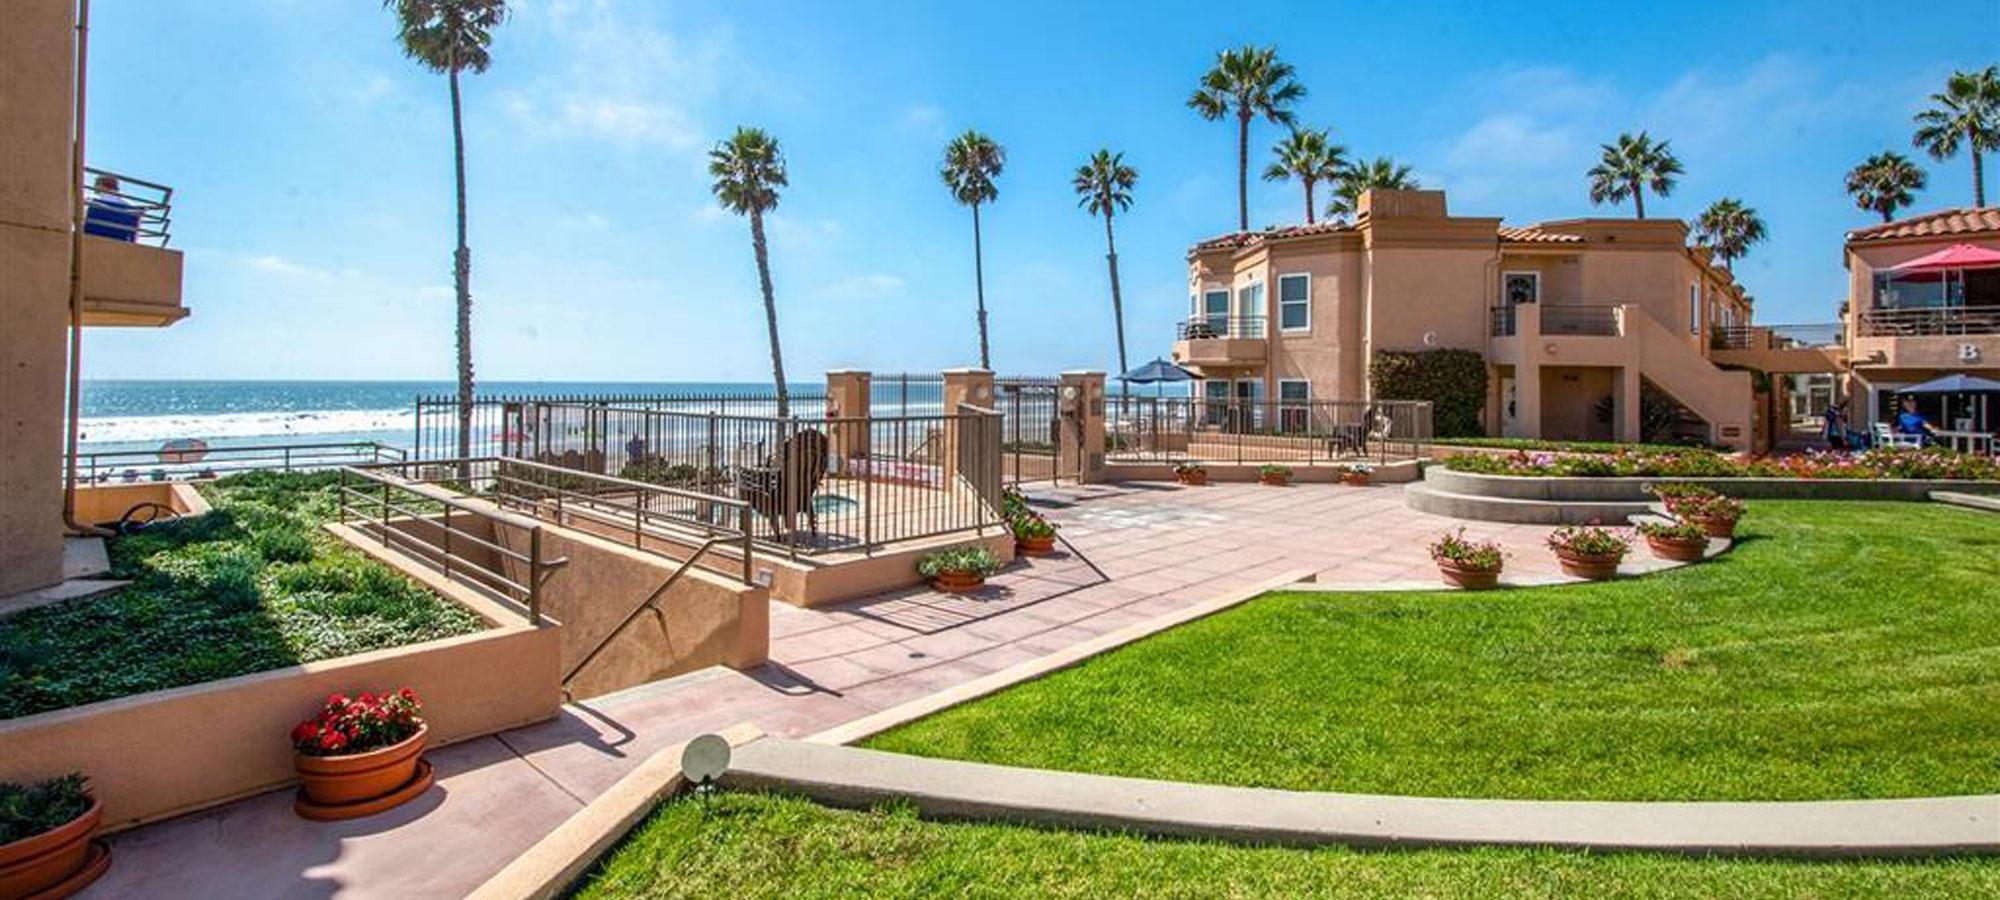 500 The Strand N UNIT 55 Oceanside, CA 92054, USA